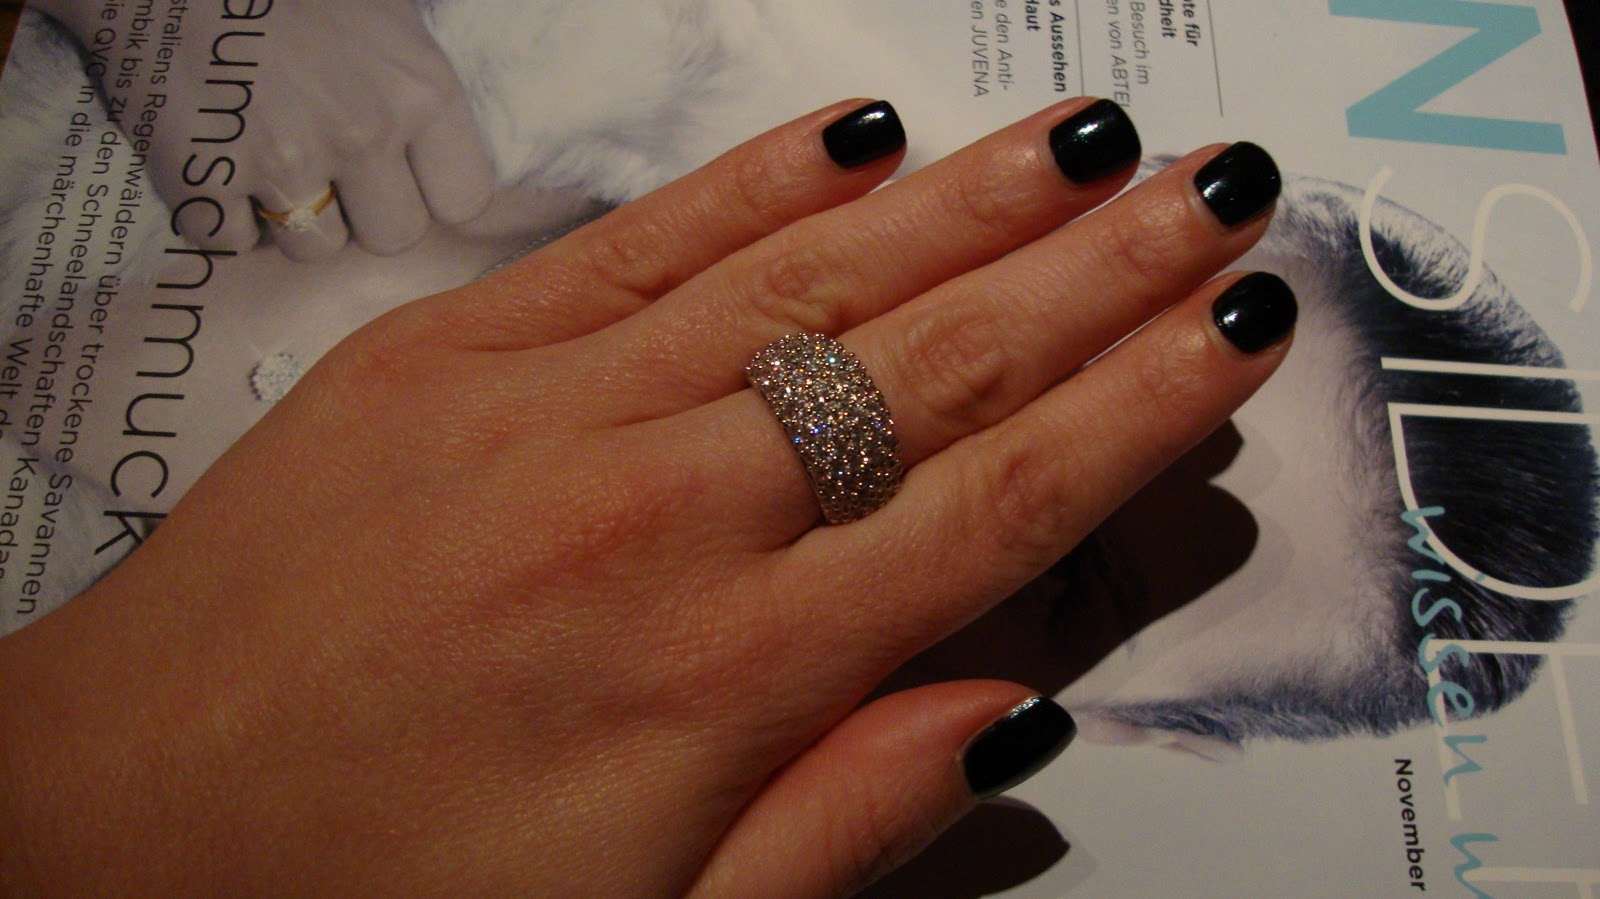 Glimmer over Glitter: Meine Ringe: Sarah Kern - Teil 2